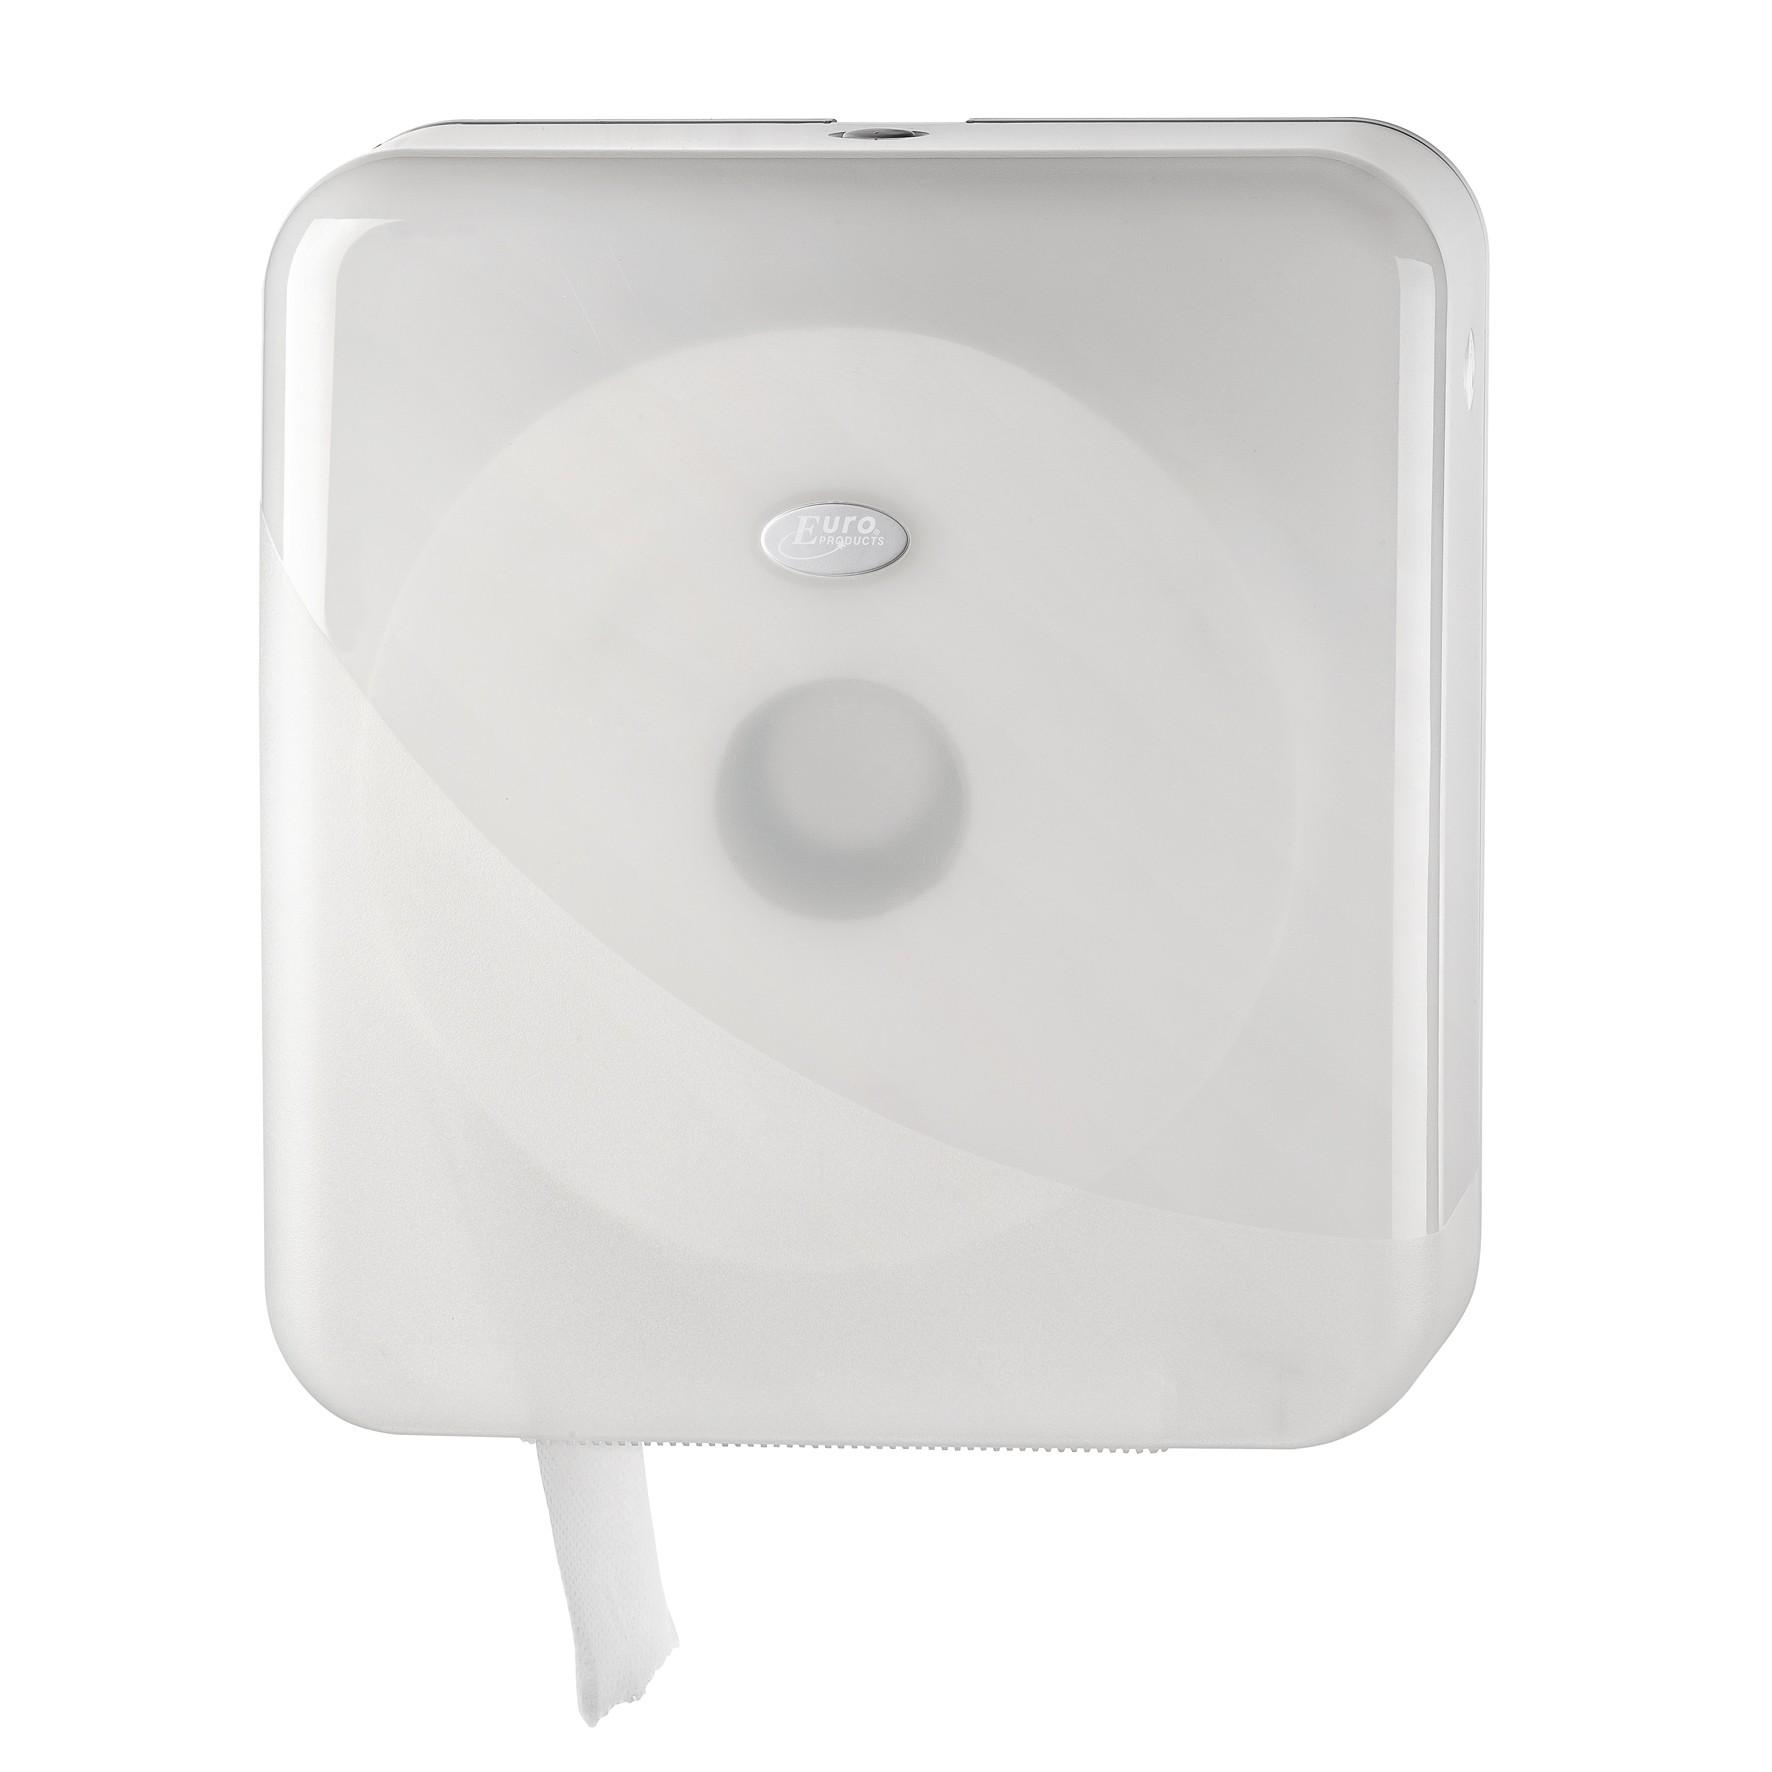 Pearl WHITE maxi jumbo toiletrol houder